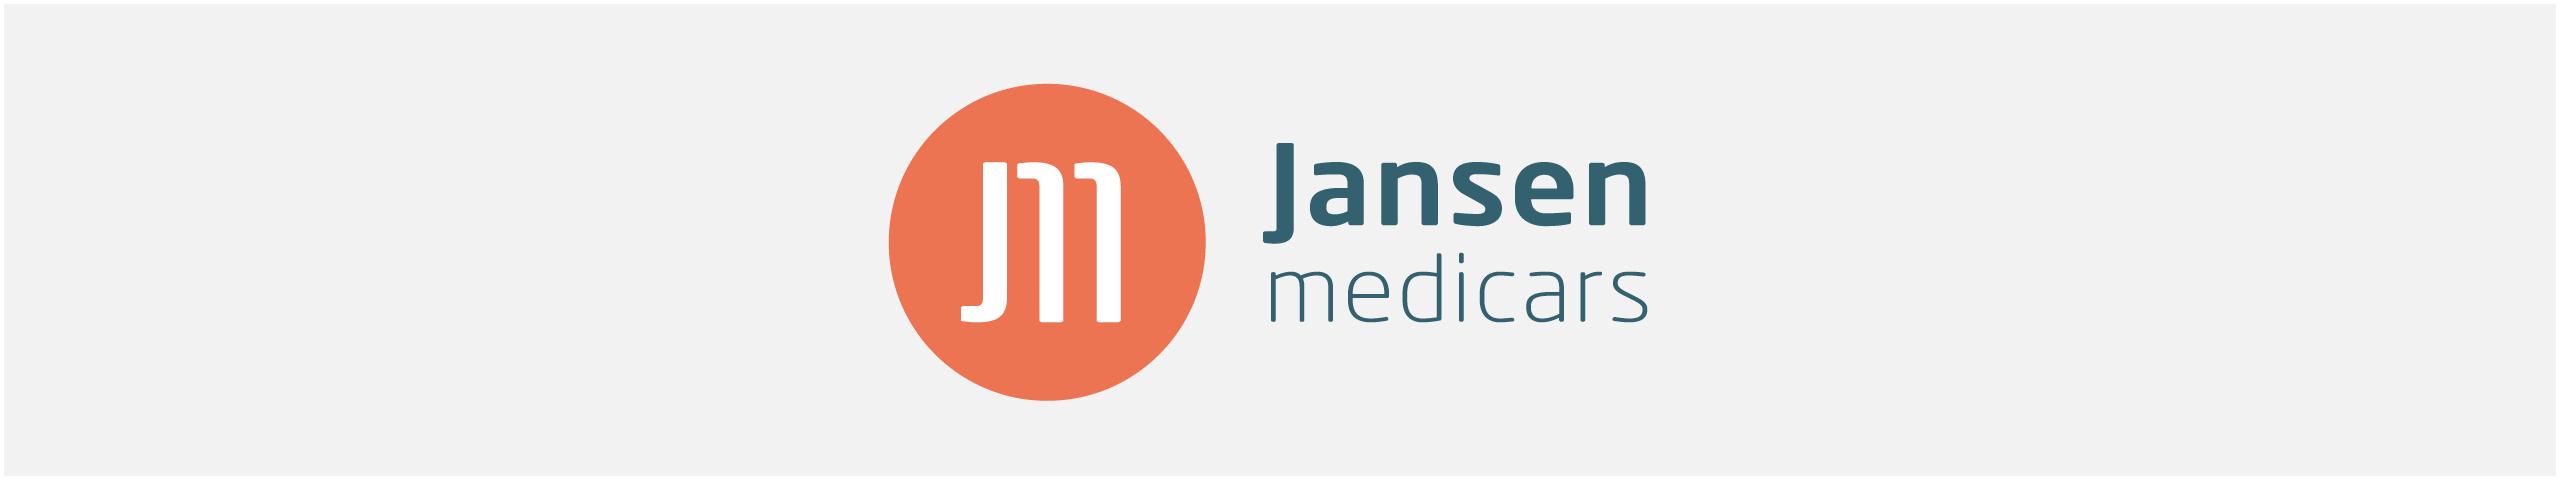 jansen medicars_logo